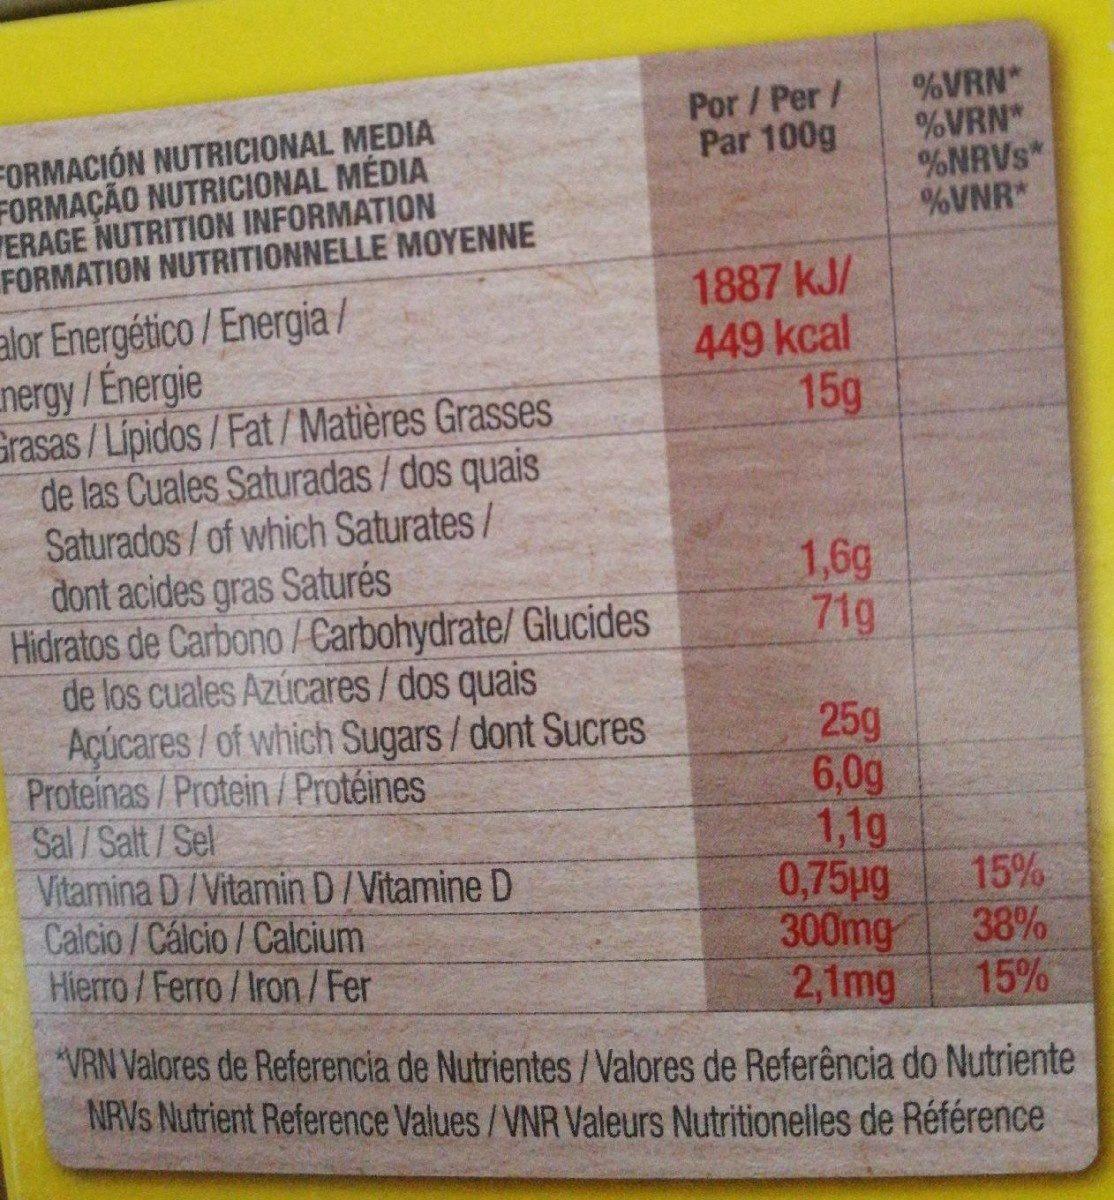 Chiquilin ositos sabor miel - Información nutricional - fr